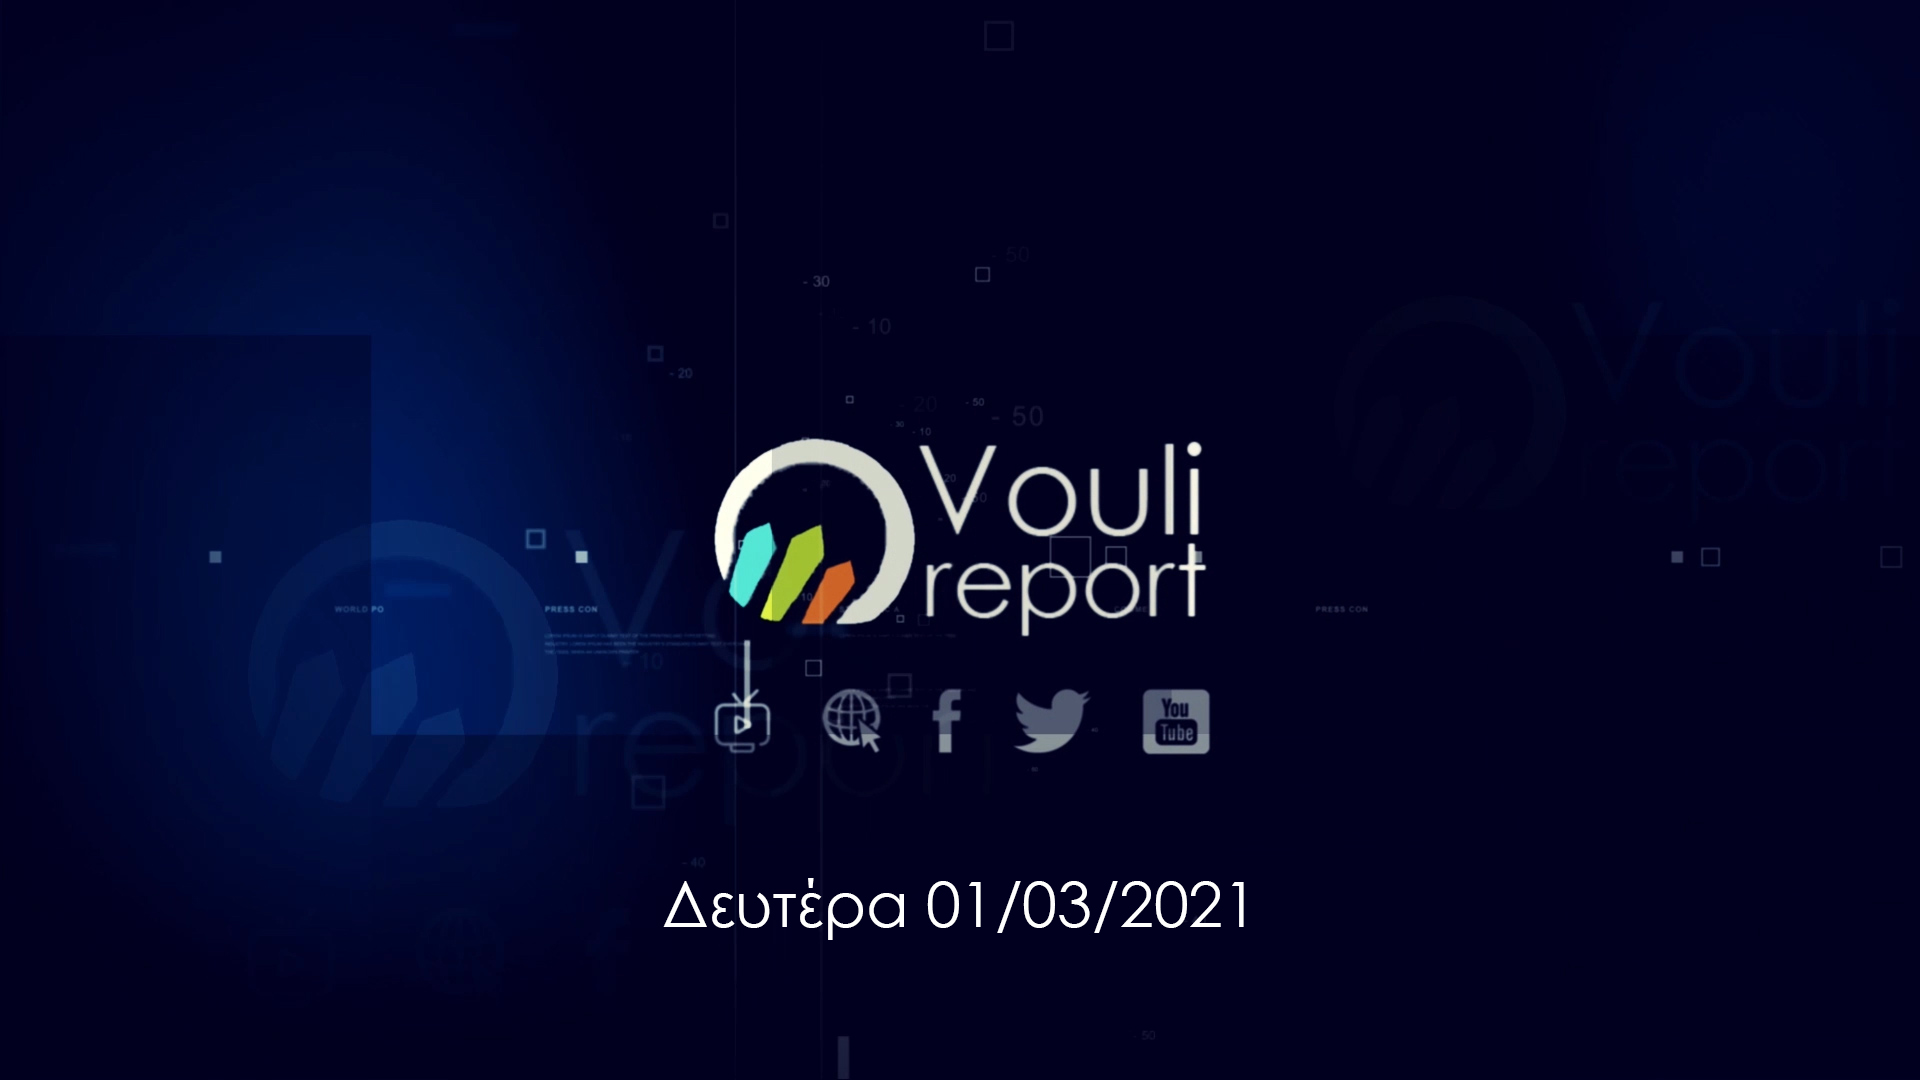 Vouli report | 01/03/2021